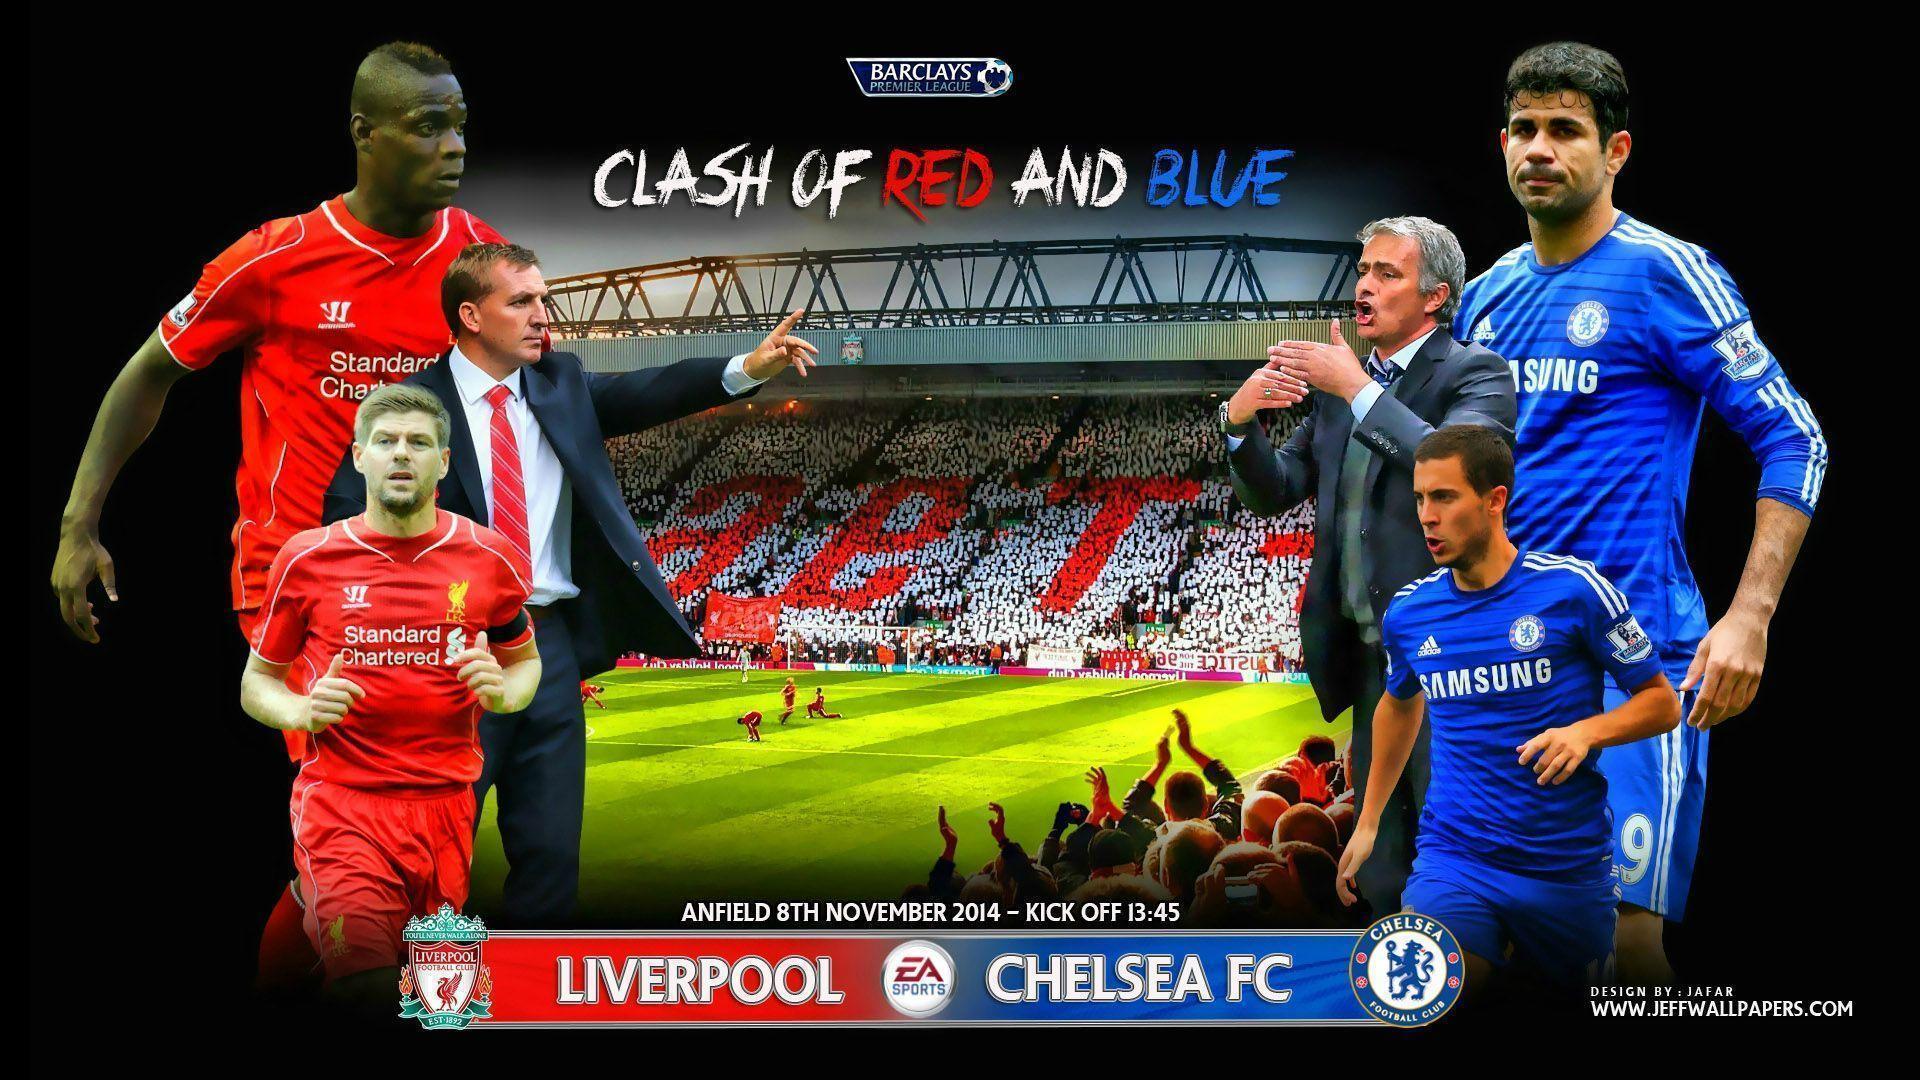 Chelsea Vs Liverpool 2014: Wallpapers Logo Liverpool 2015